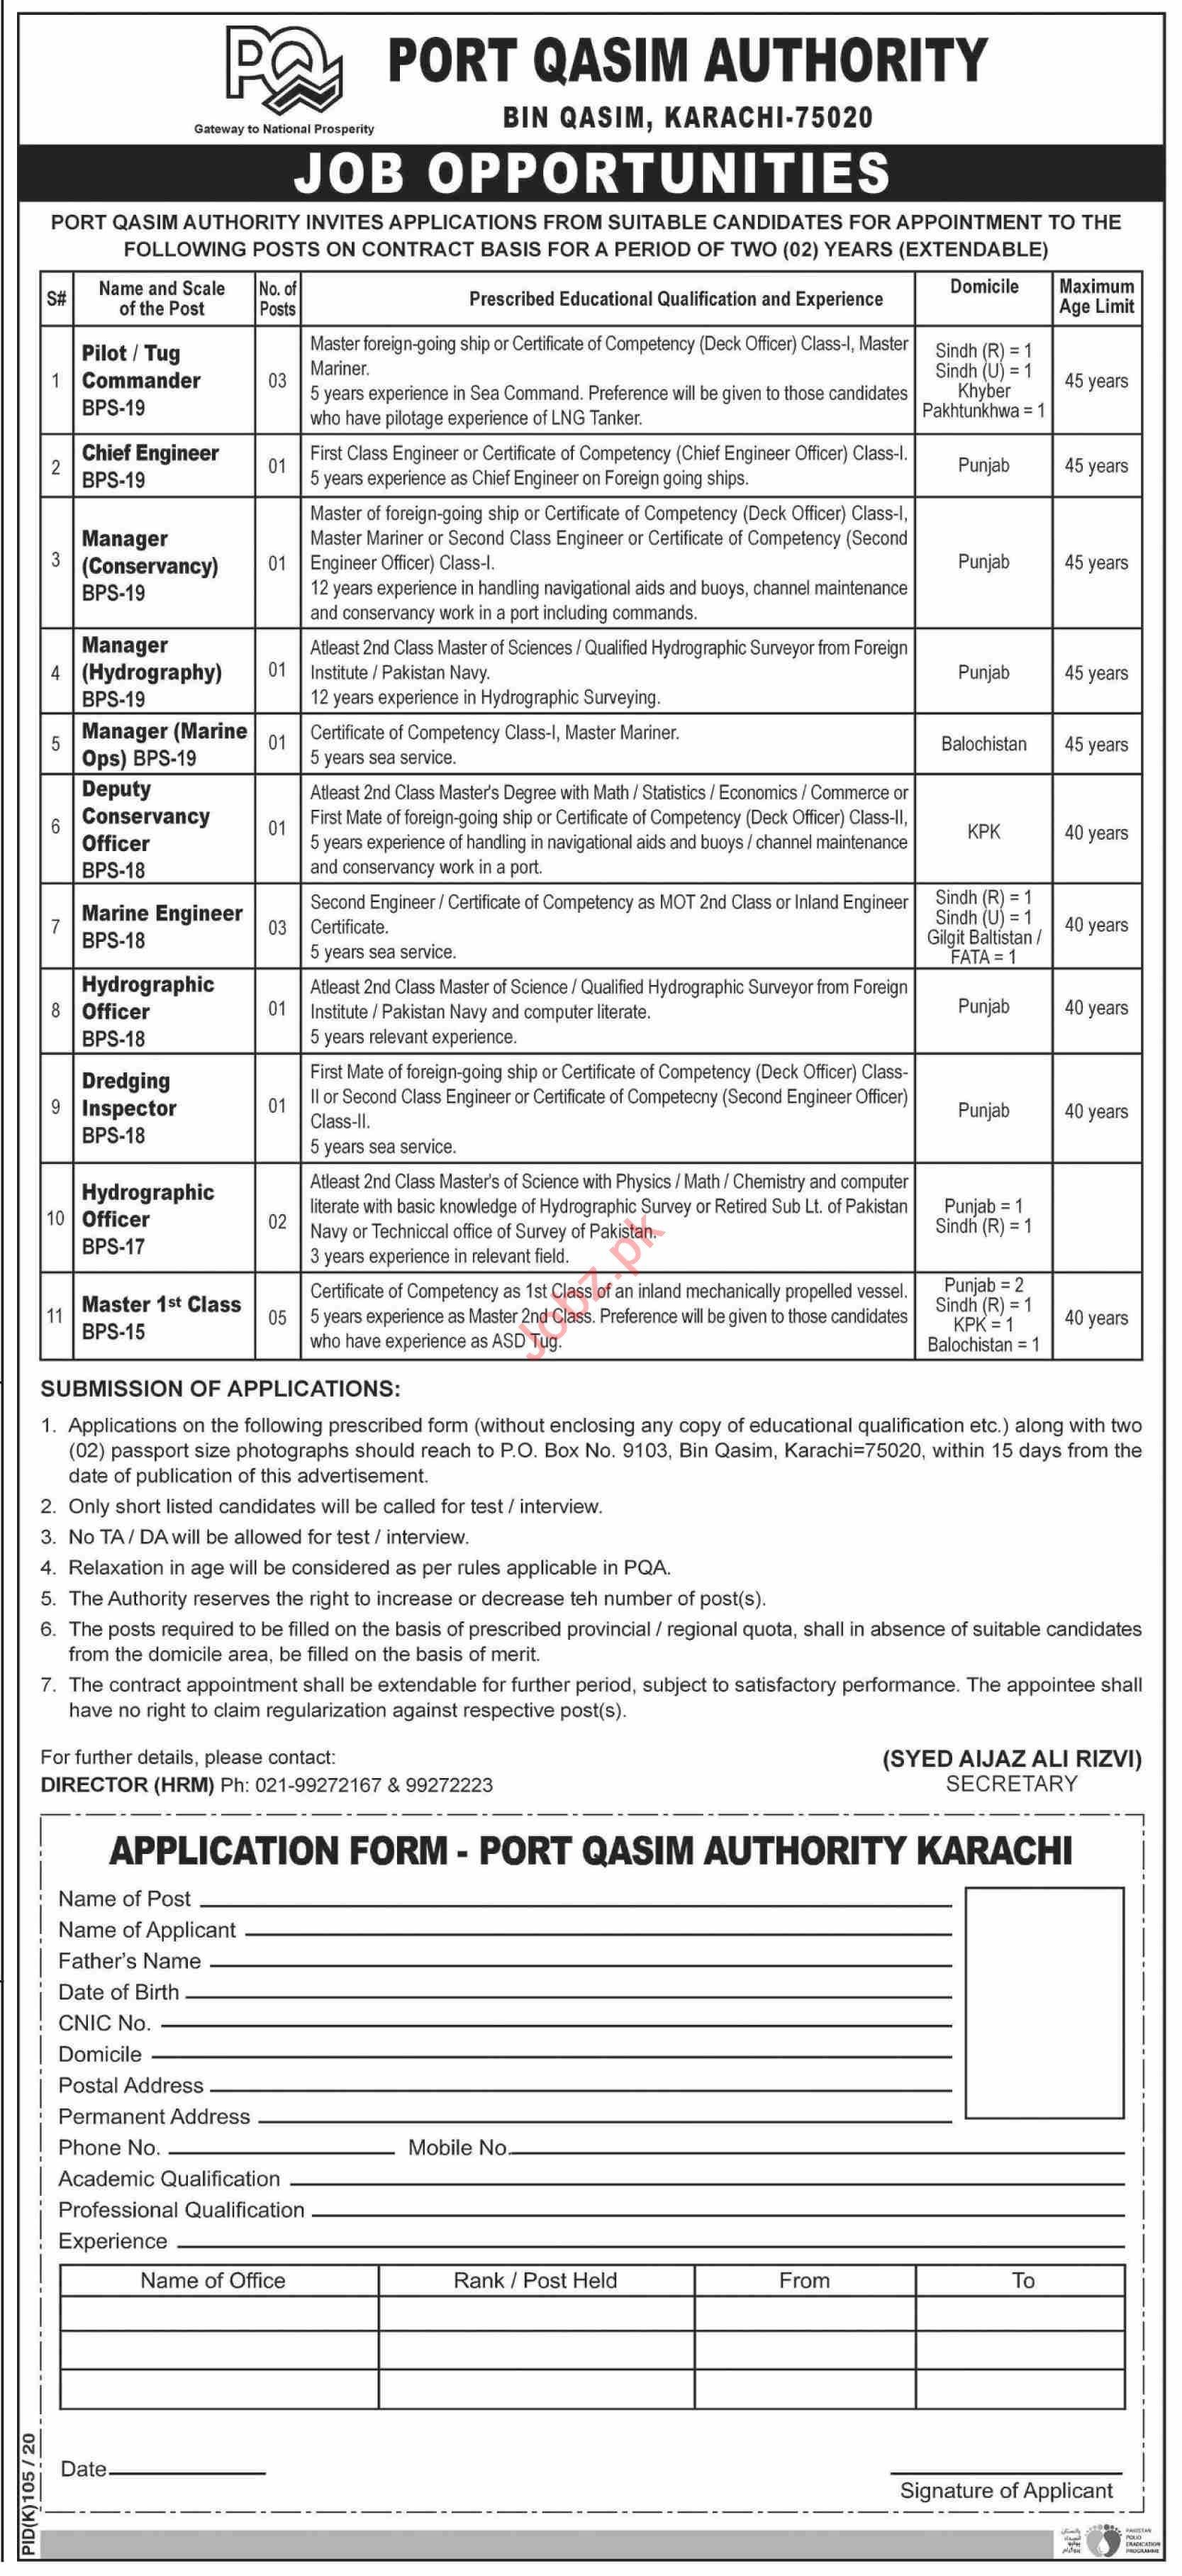 Port Qasim Authority PQA Karachi Jobs 2020 Pilot & Managers